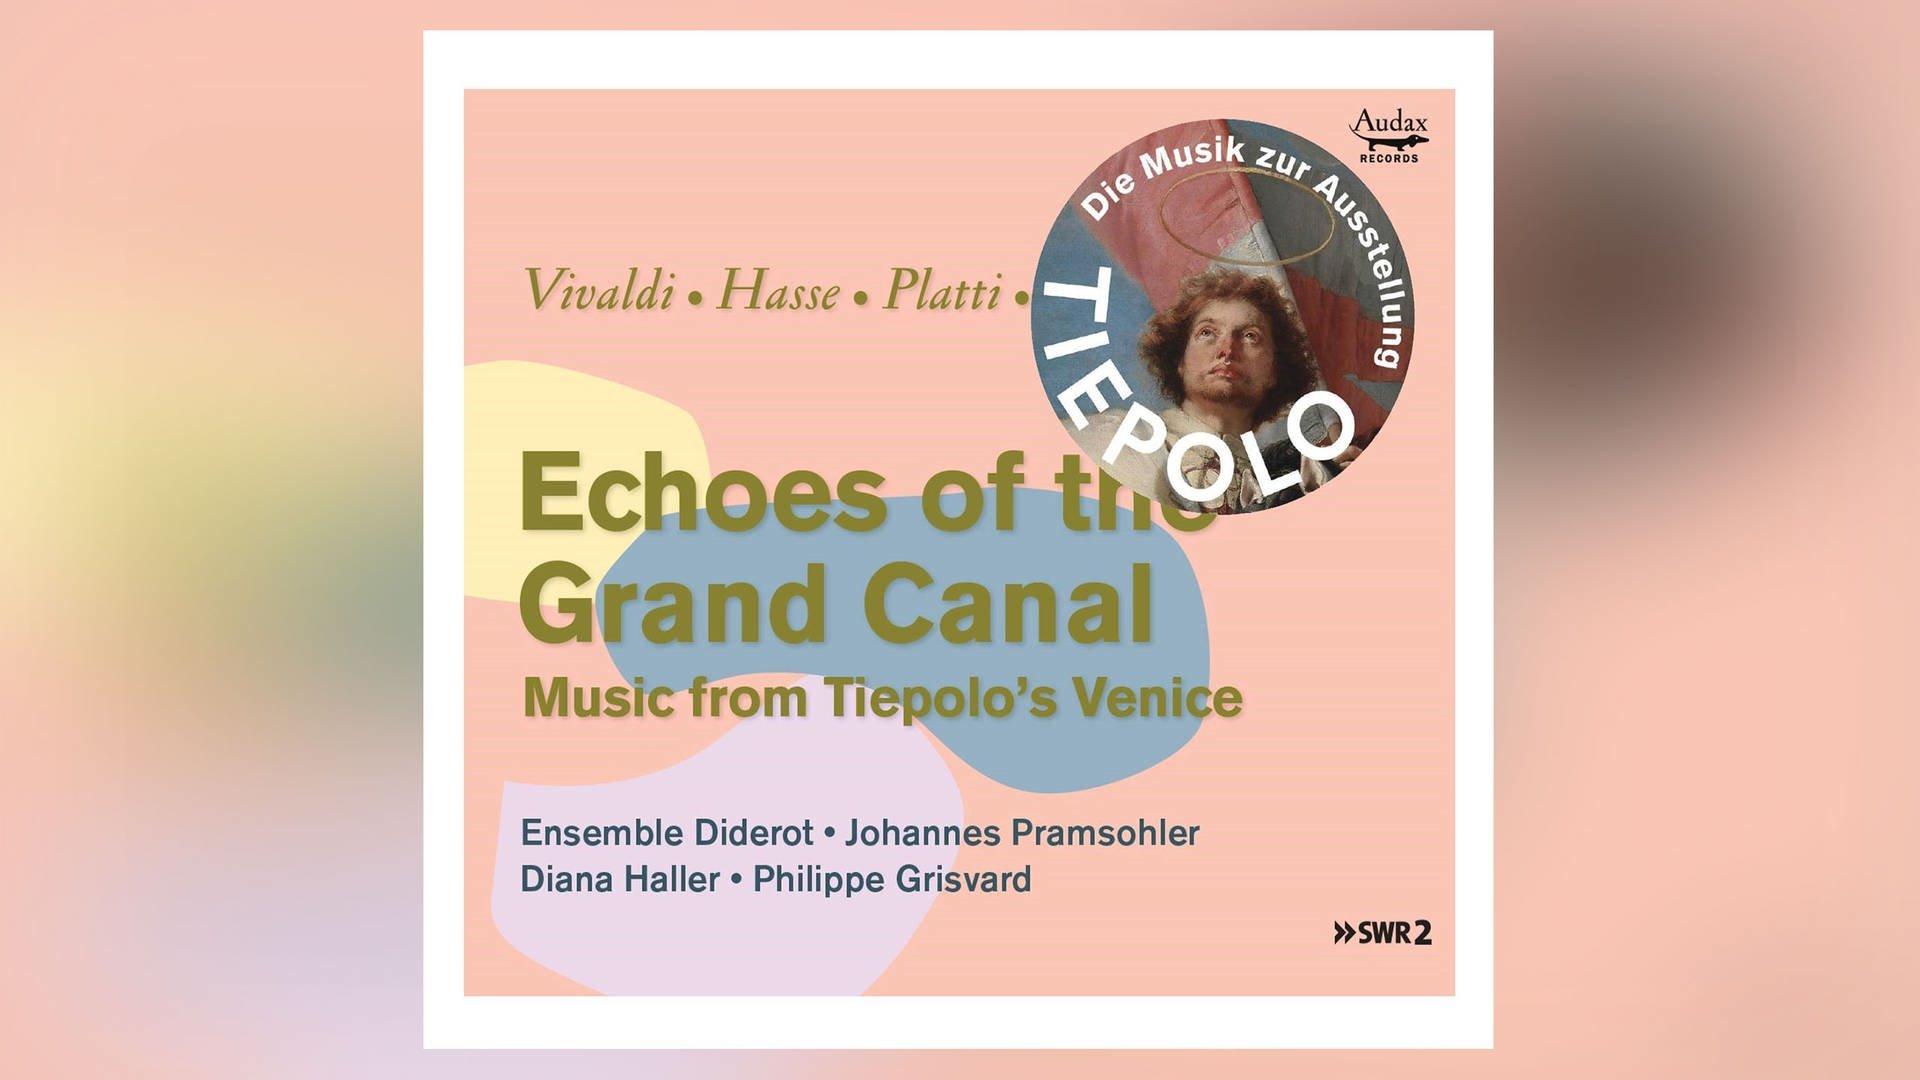 Der-Soundtrack-zur-Tiepolo-Ausstellung-Echoes-of-the-Grand-Canal,1570451372578,die-cd-zu-tiepolo-100 V-16x9@2dXL -77ed5d09bafd4e3cf6a5a0264e5e16ea35f14925